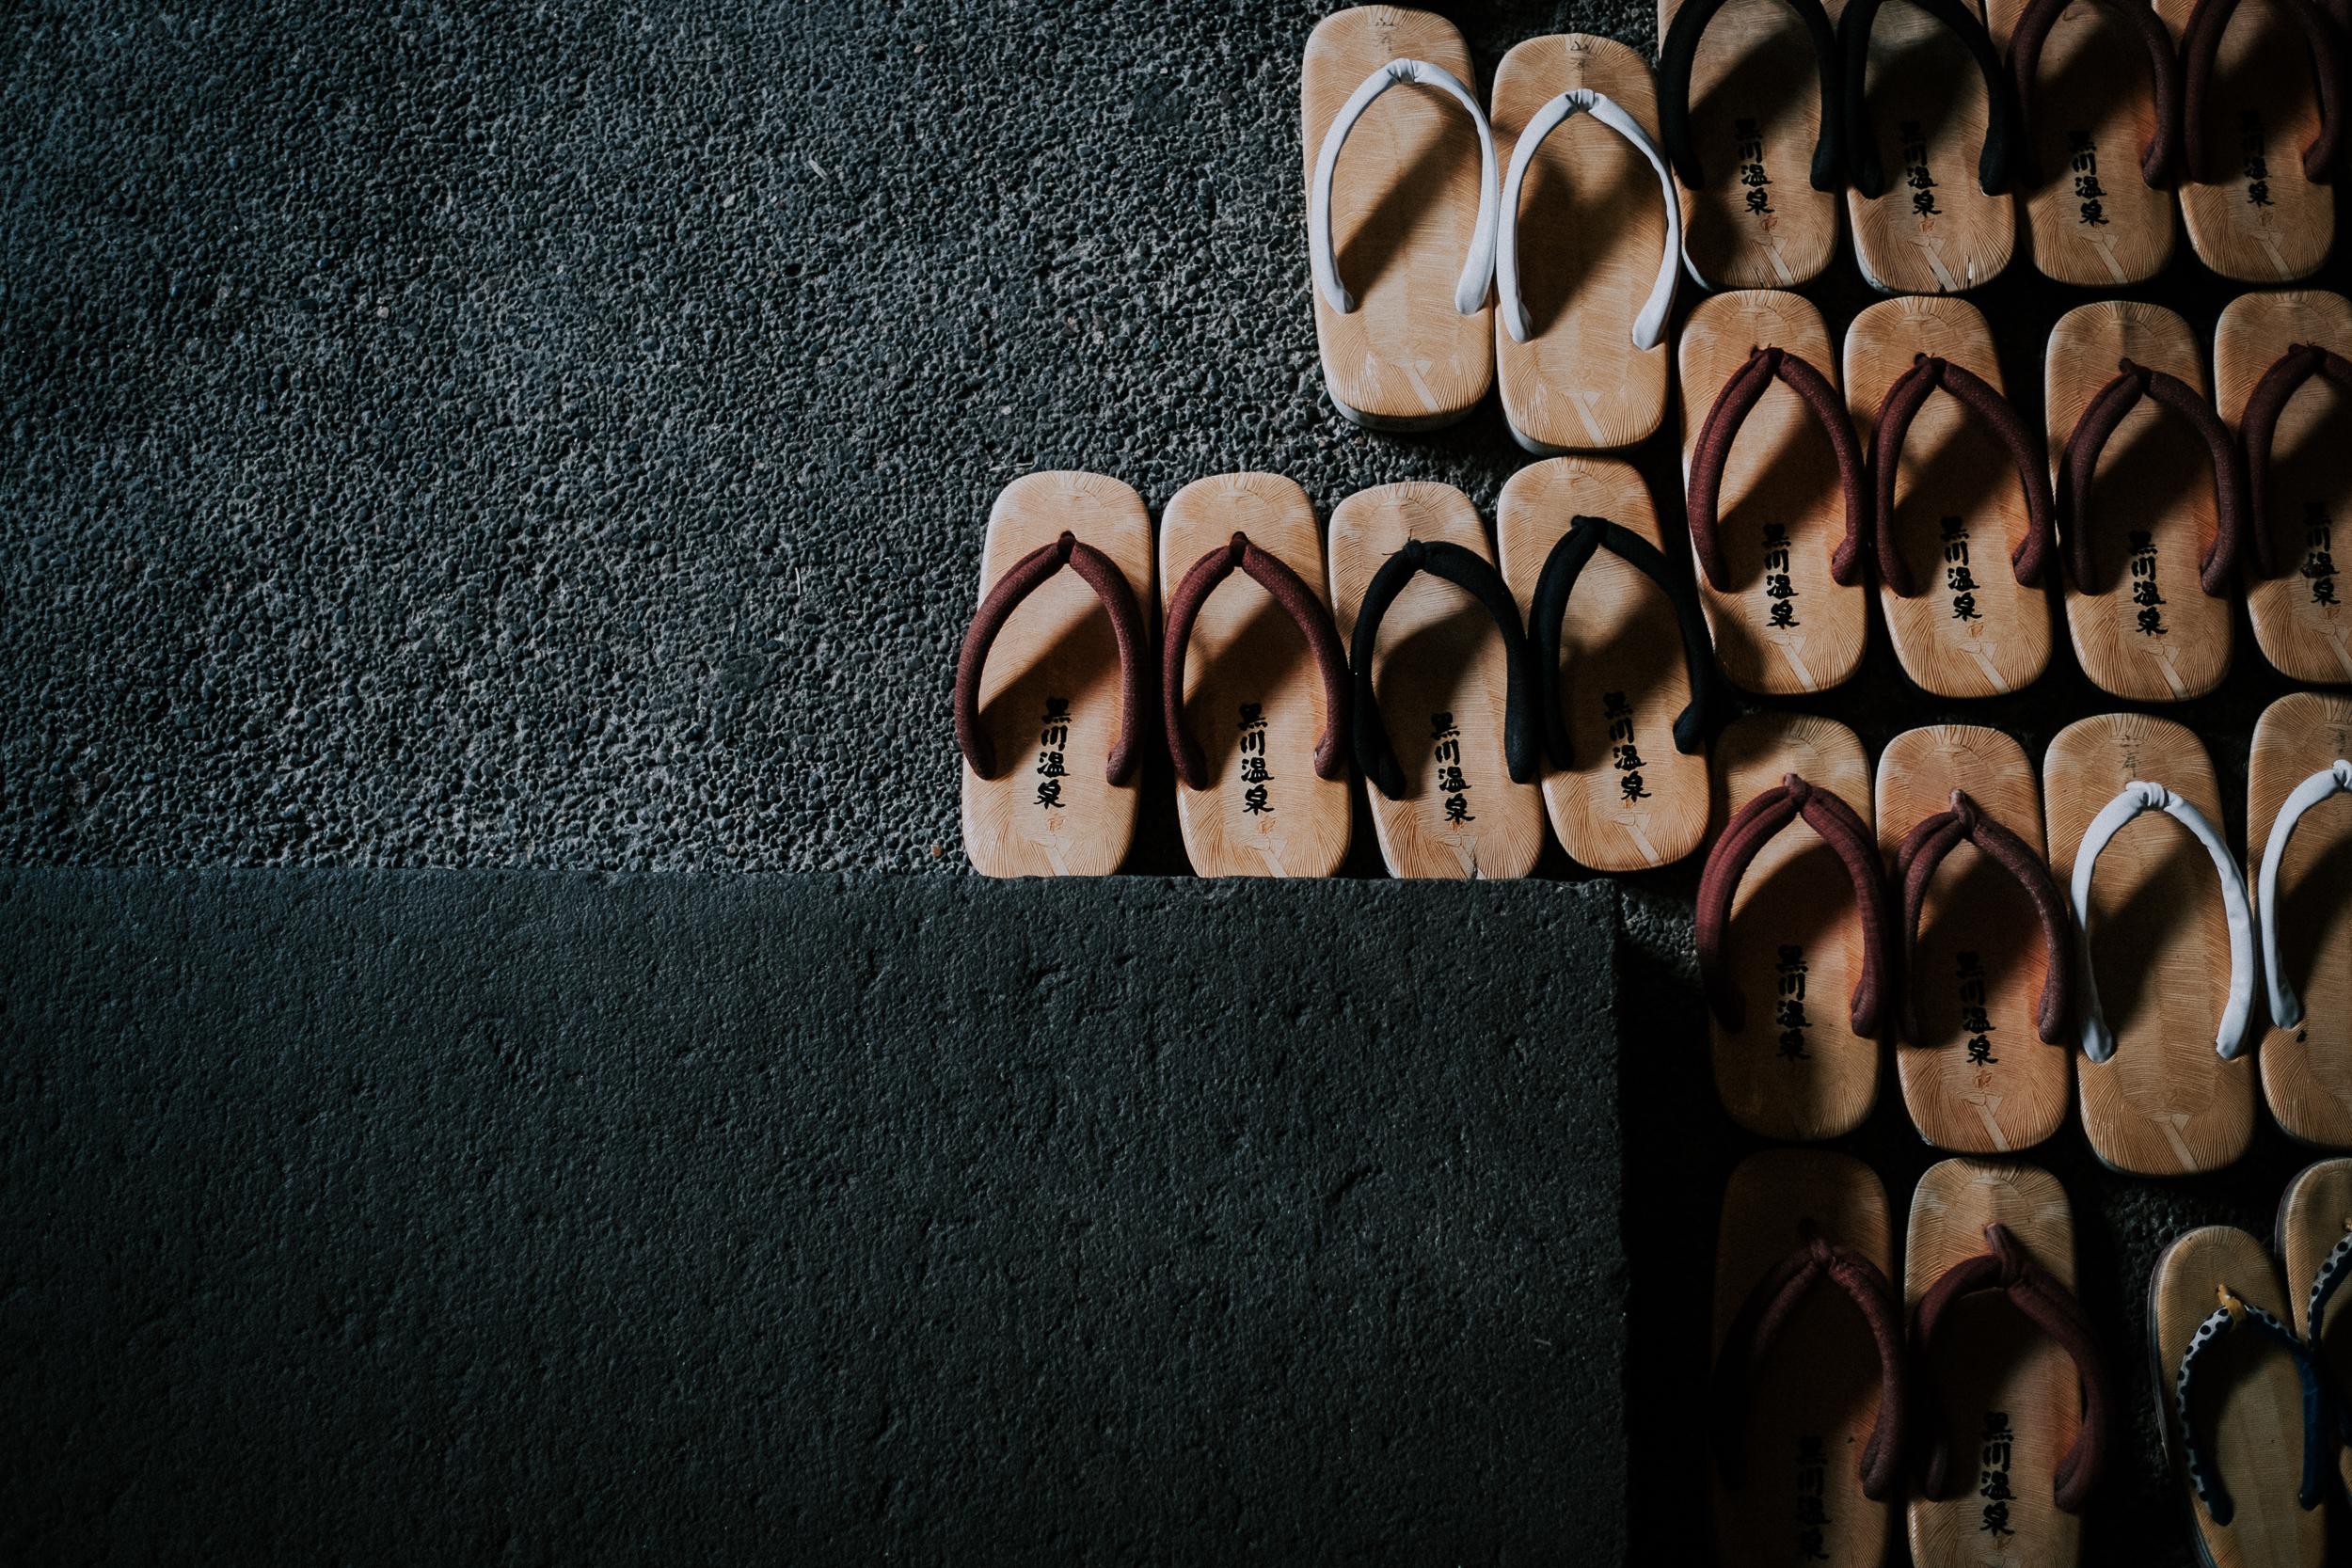 Onsen sandals lined up at Ryokan Sanga.